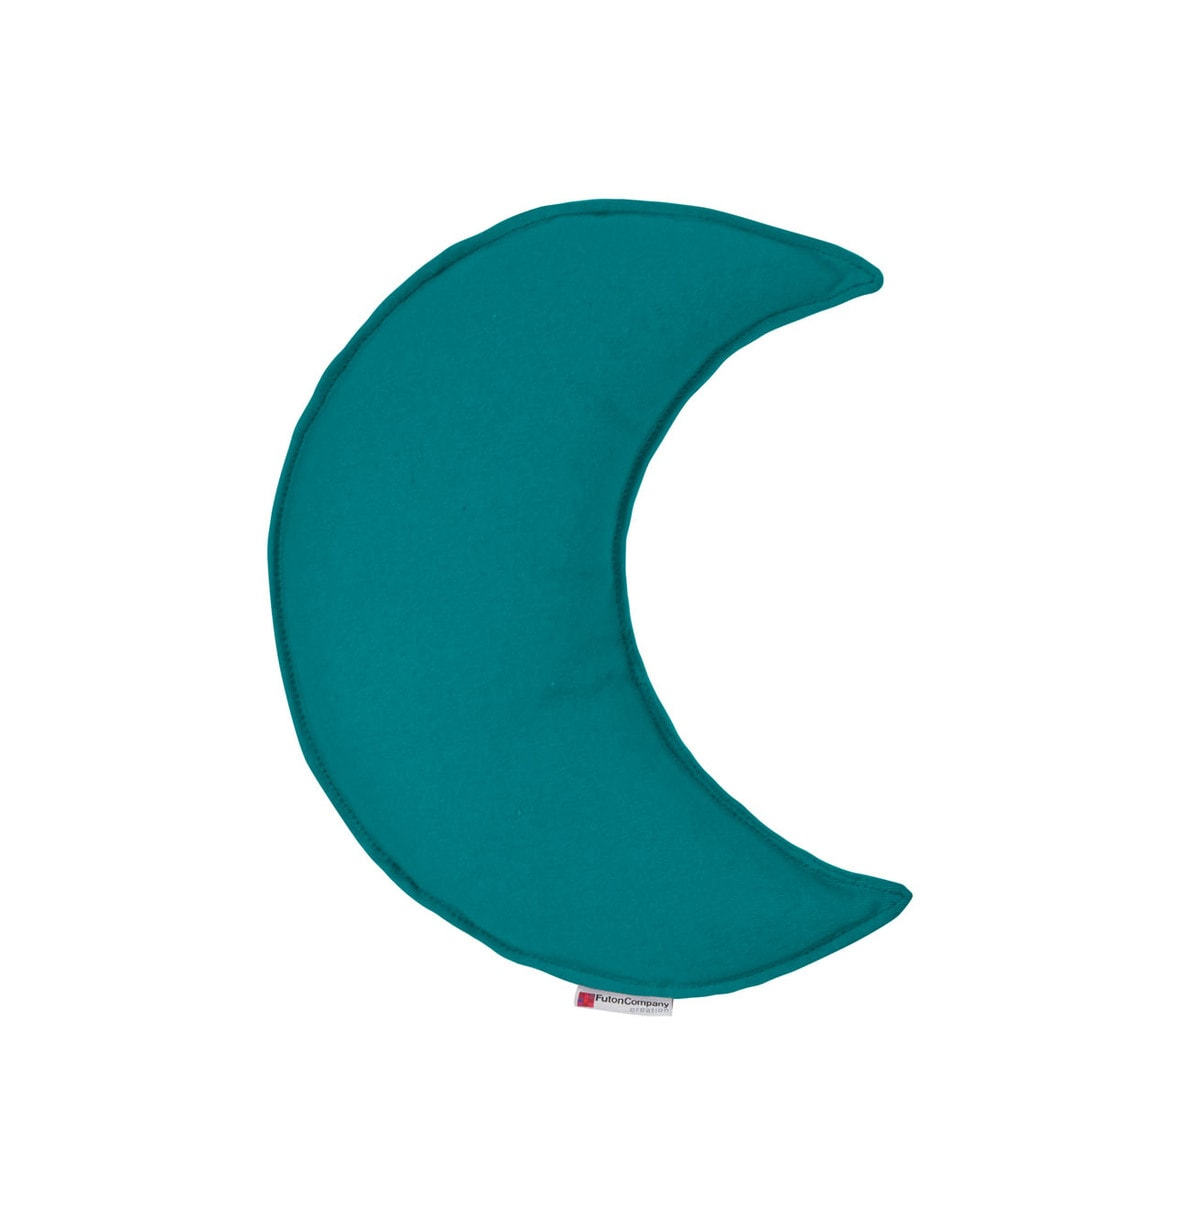 Almofada-Lua-Sharp-M-Tecido-Sarja-Azul-Tiffany-01